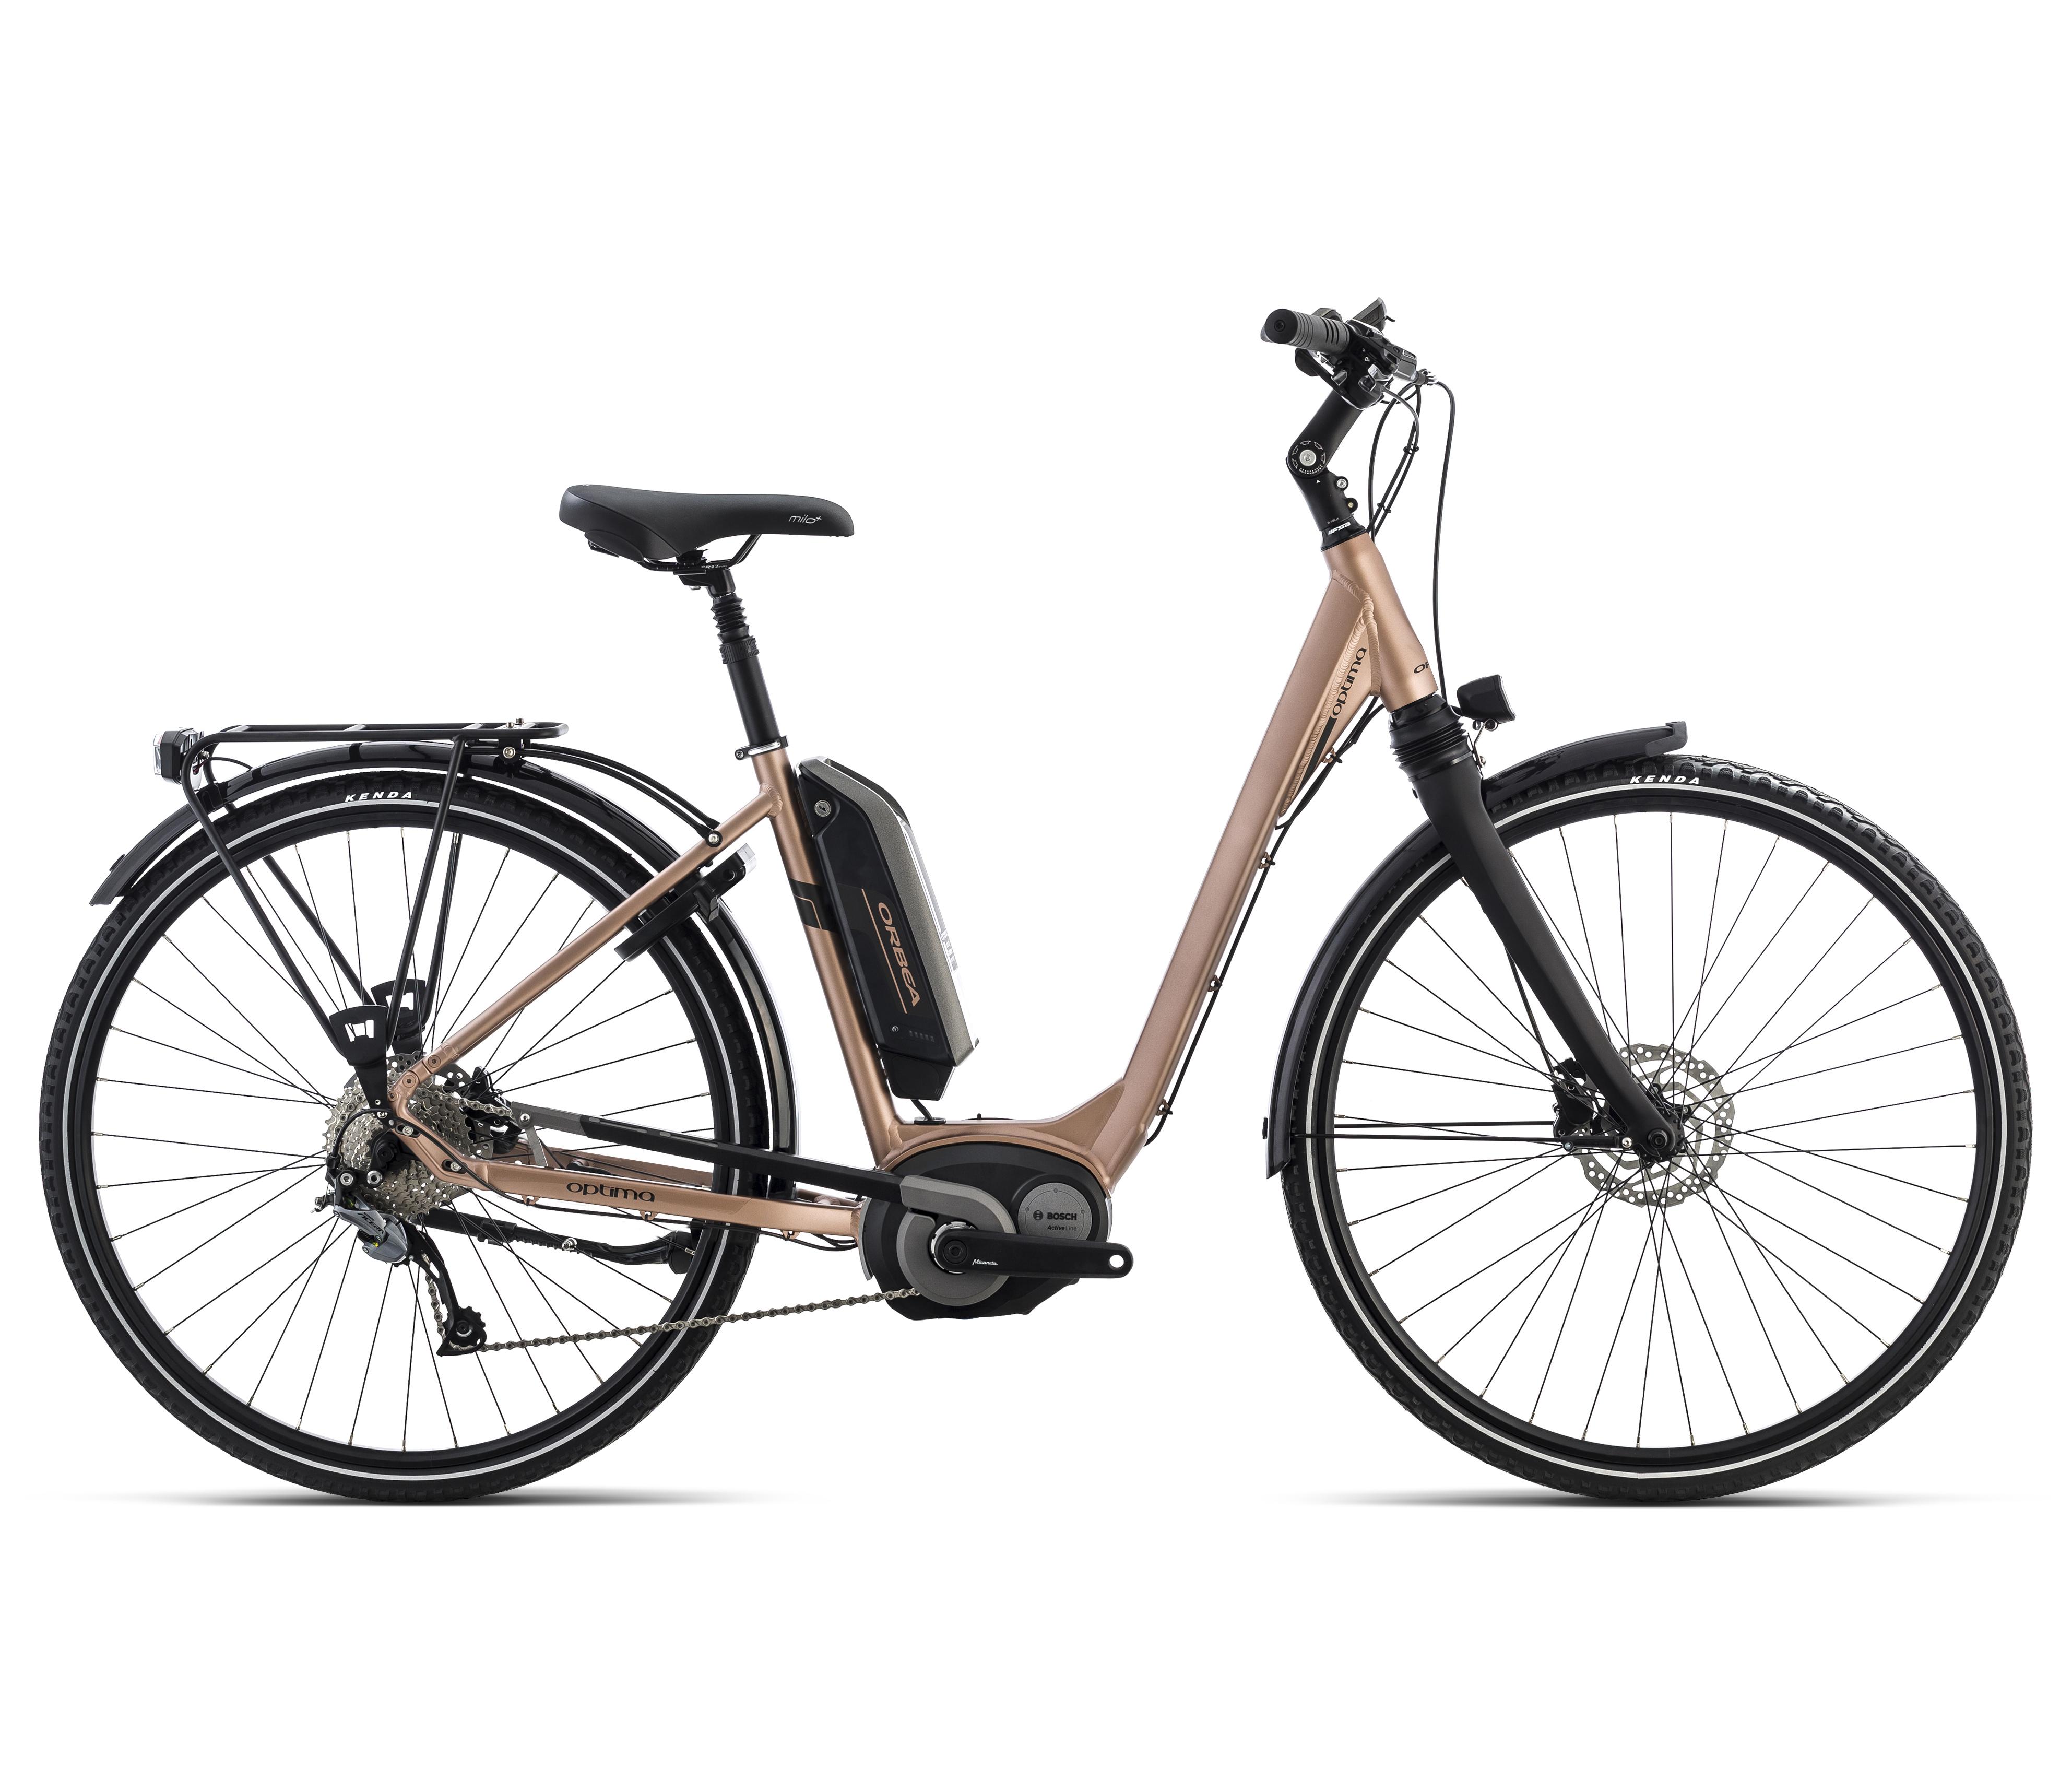 orbea versand orbea e bike optima comfort 20 online kaufen. Black Bedroom Furniture Sets. Home Design Ideas